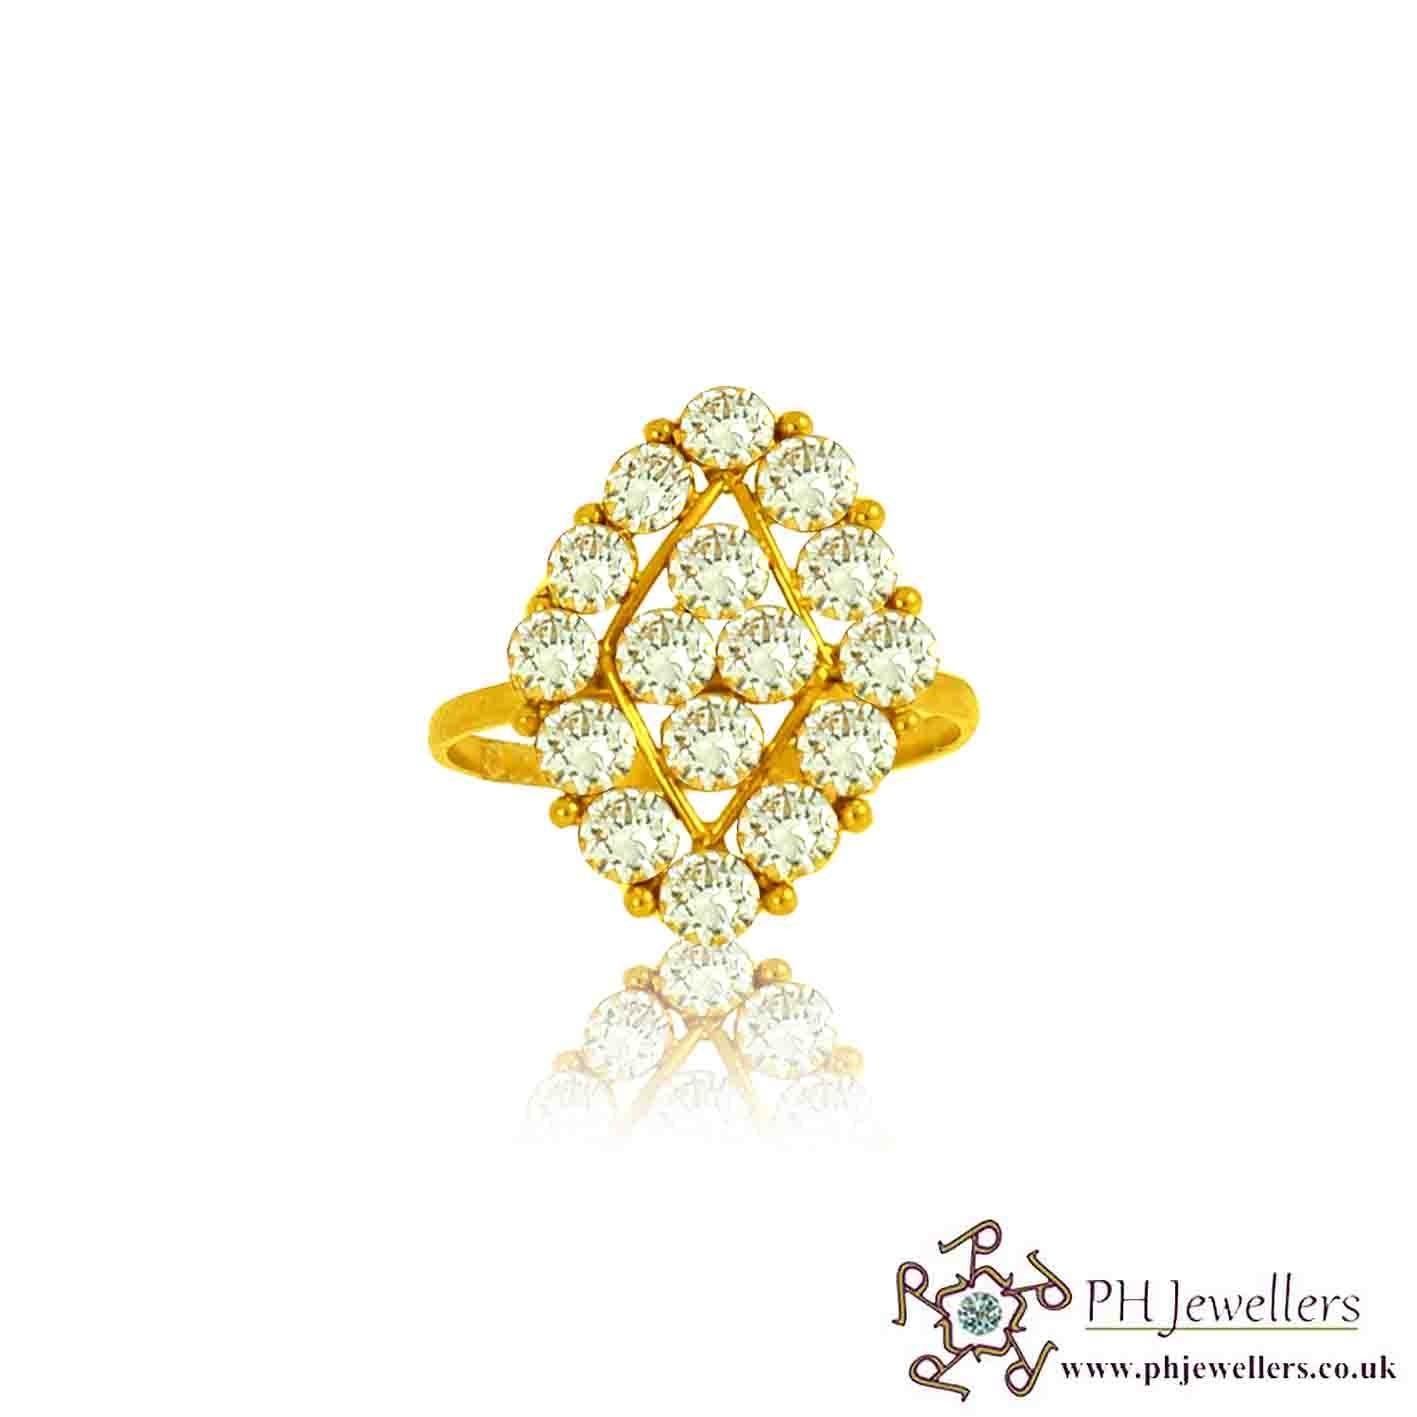 22ct 916 Hallmark Yellow Gold Size K1/2 Ring CZ SR92